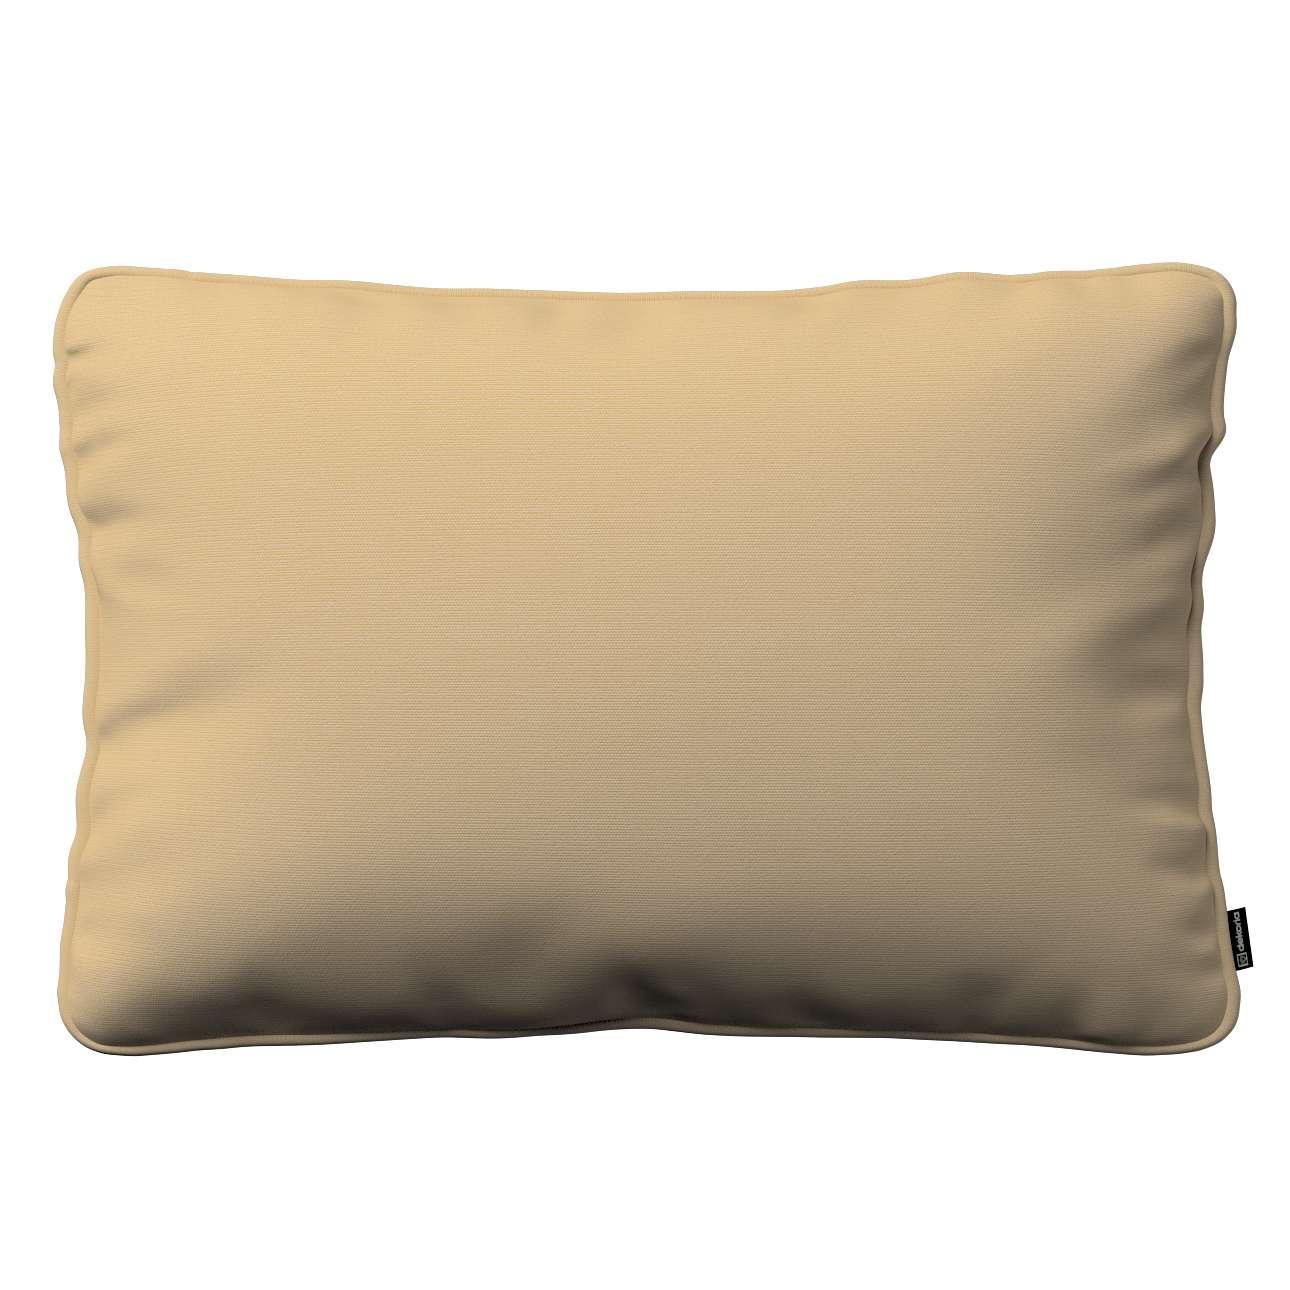 Gabi - potah na polštář šňůrka po obvodu obdélníkový v kolekci Cotton Panama, látka: 702-01